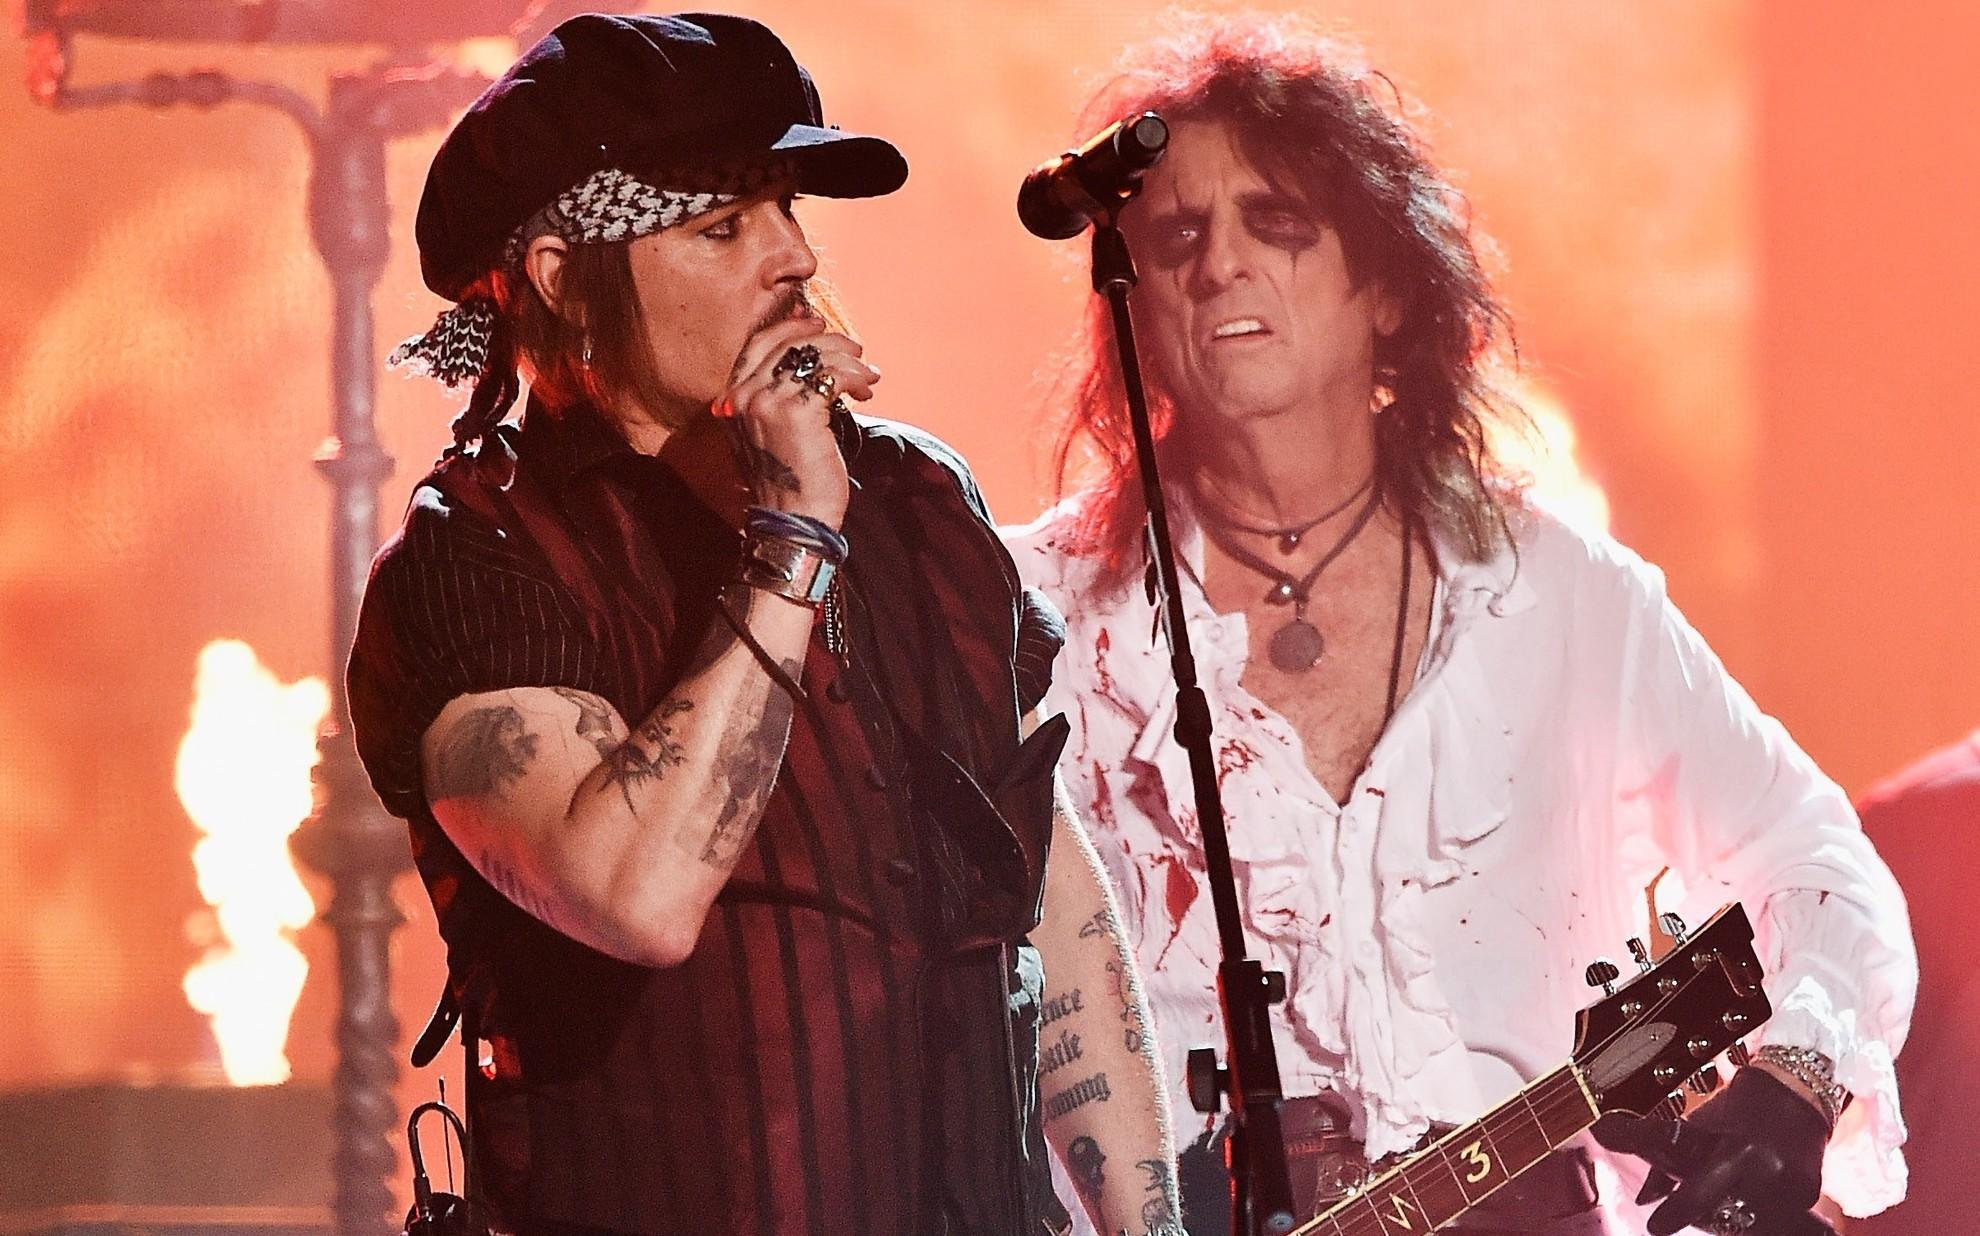 Actor Johnny Depp rocks out with Alice Cooper (Kevork Djansezian/Getty Images)